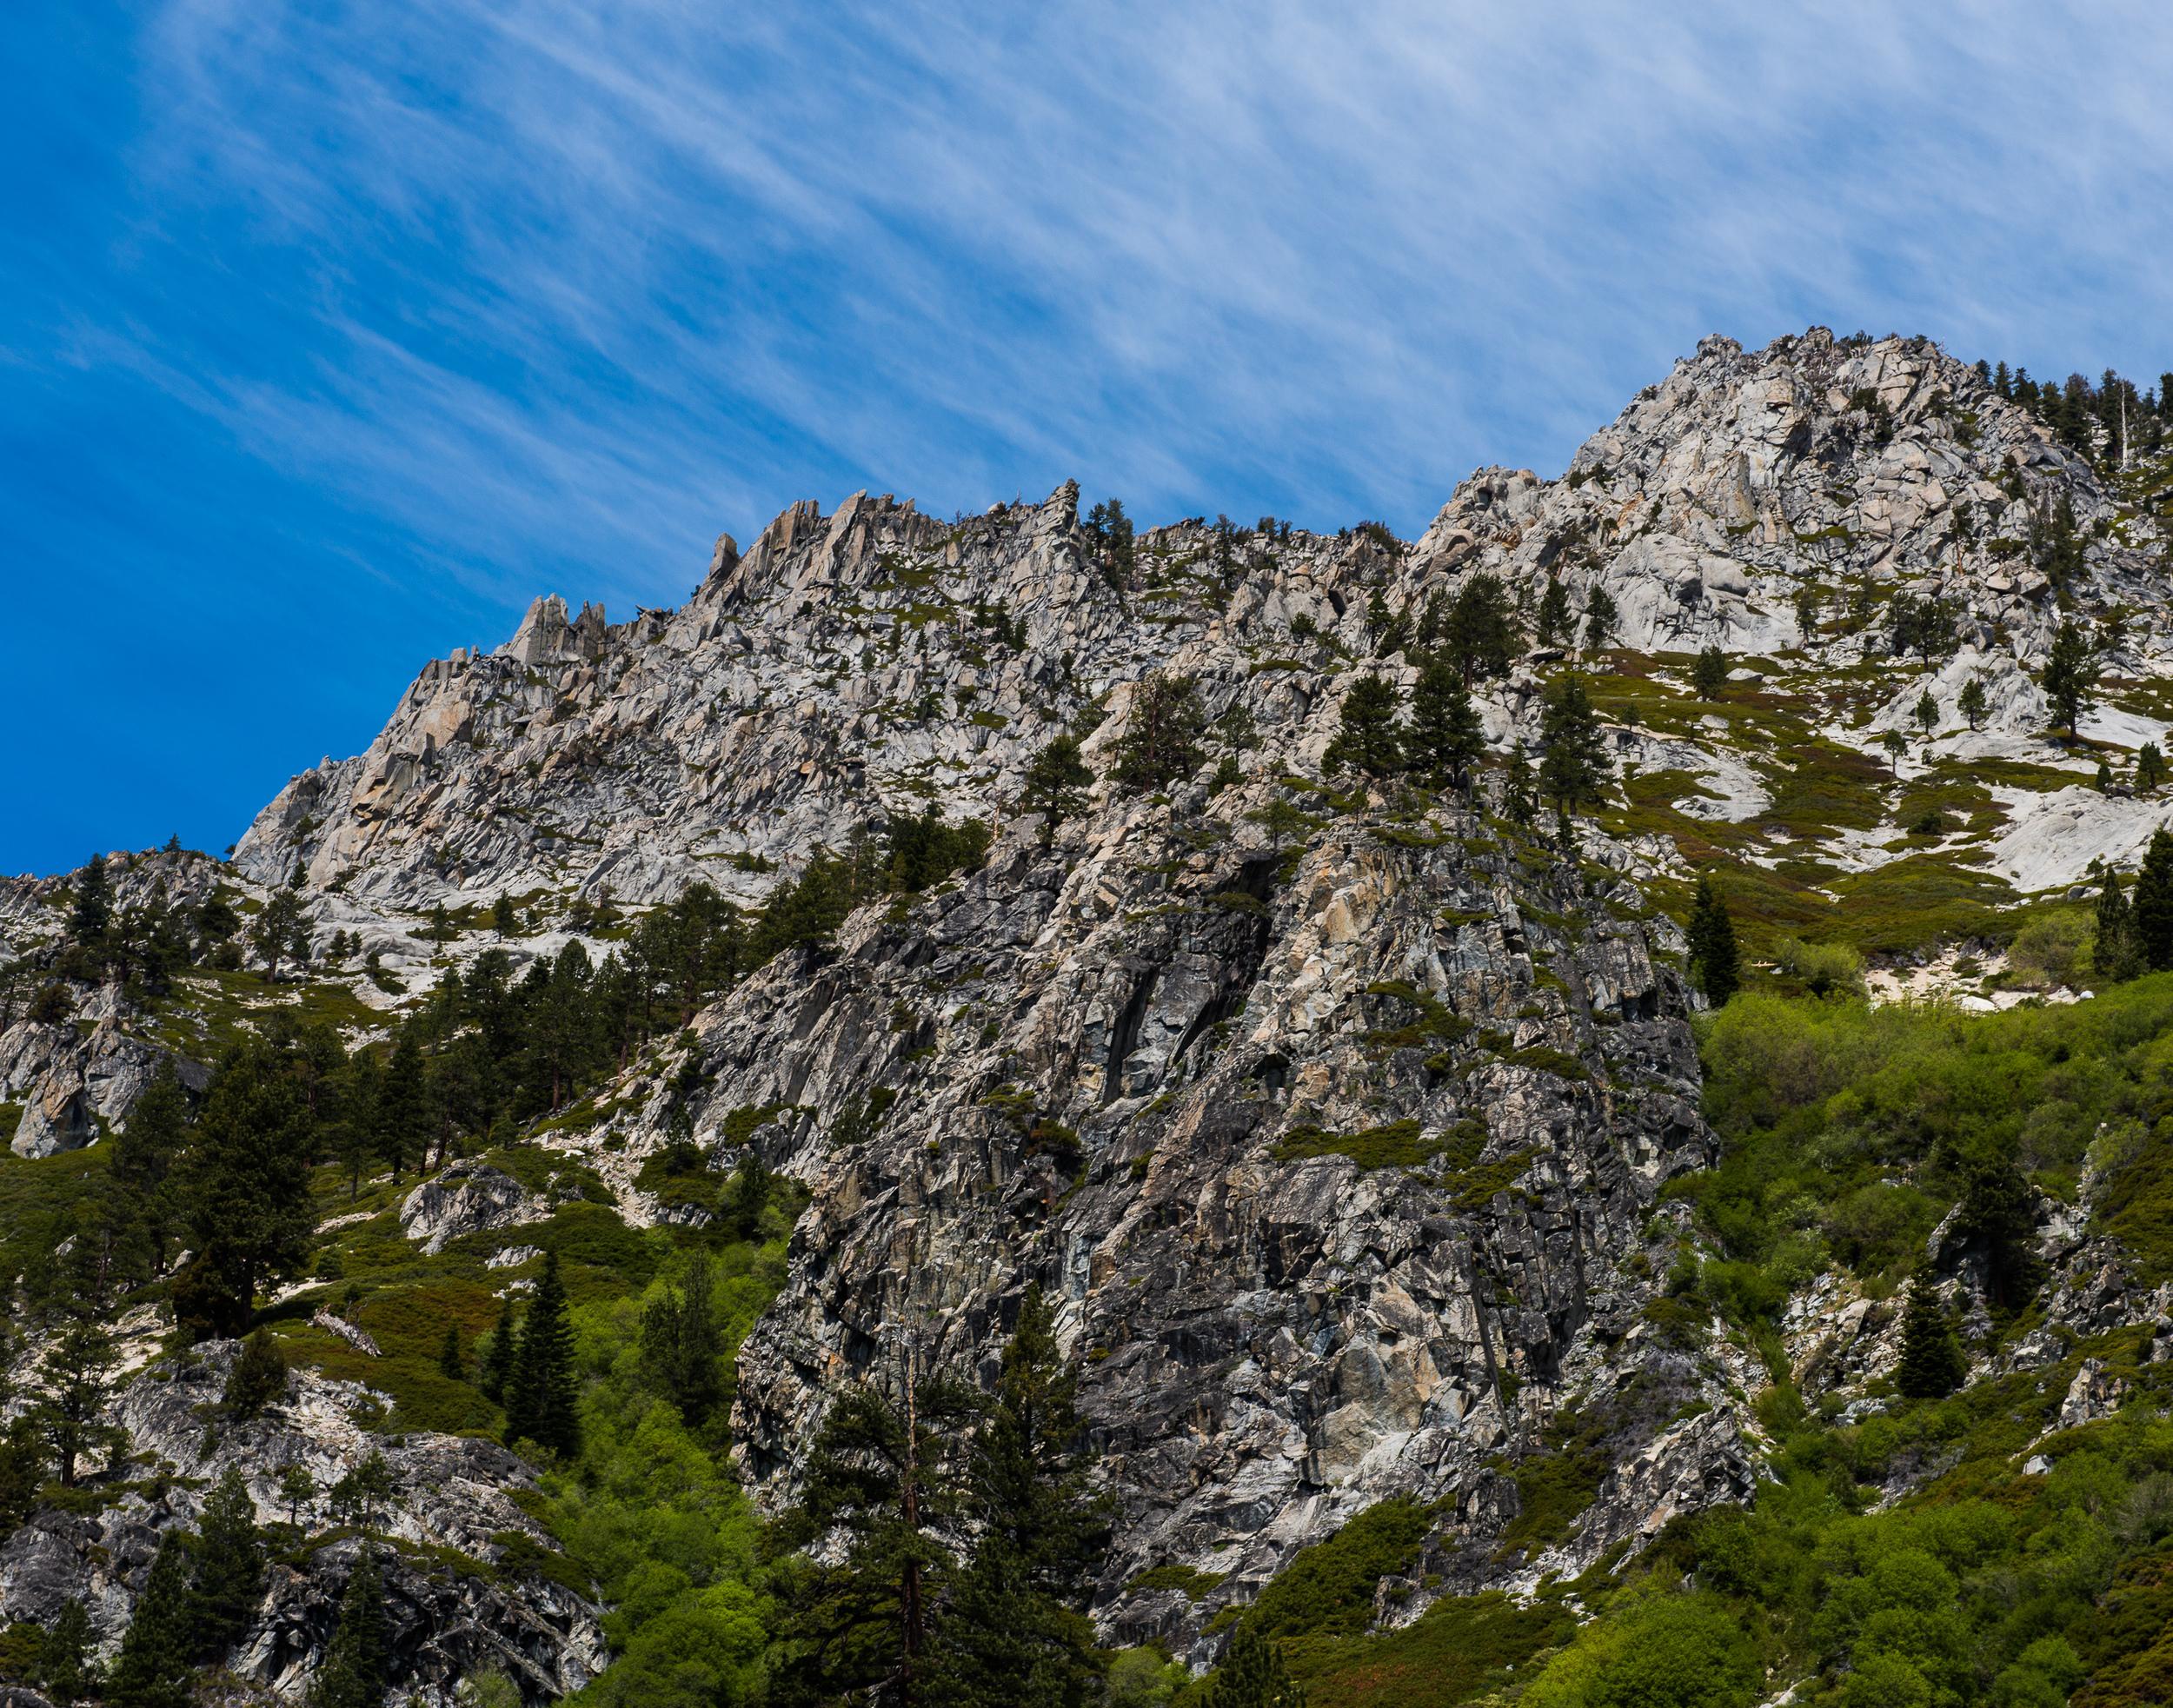 Landscape_Mediate-21.jpg